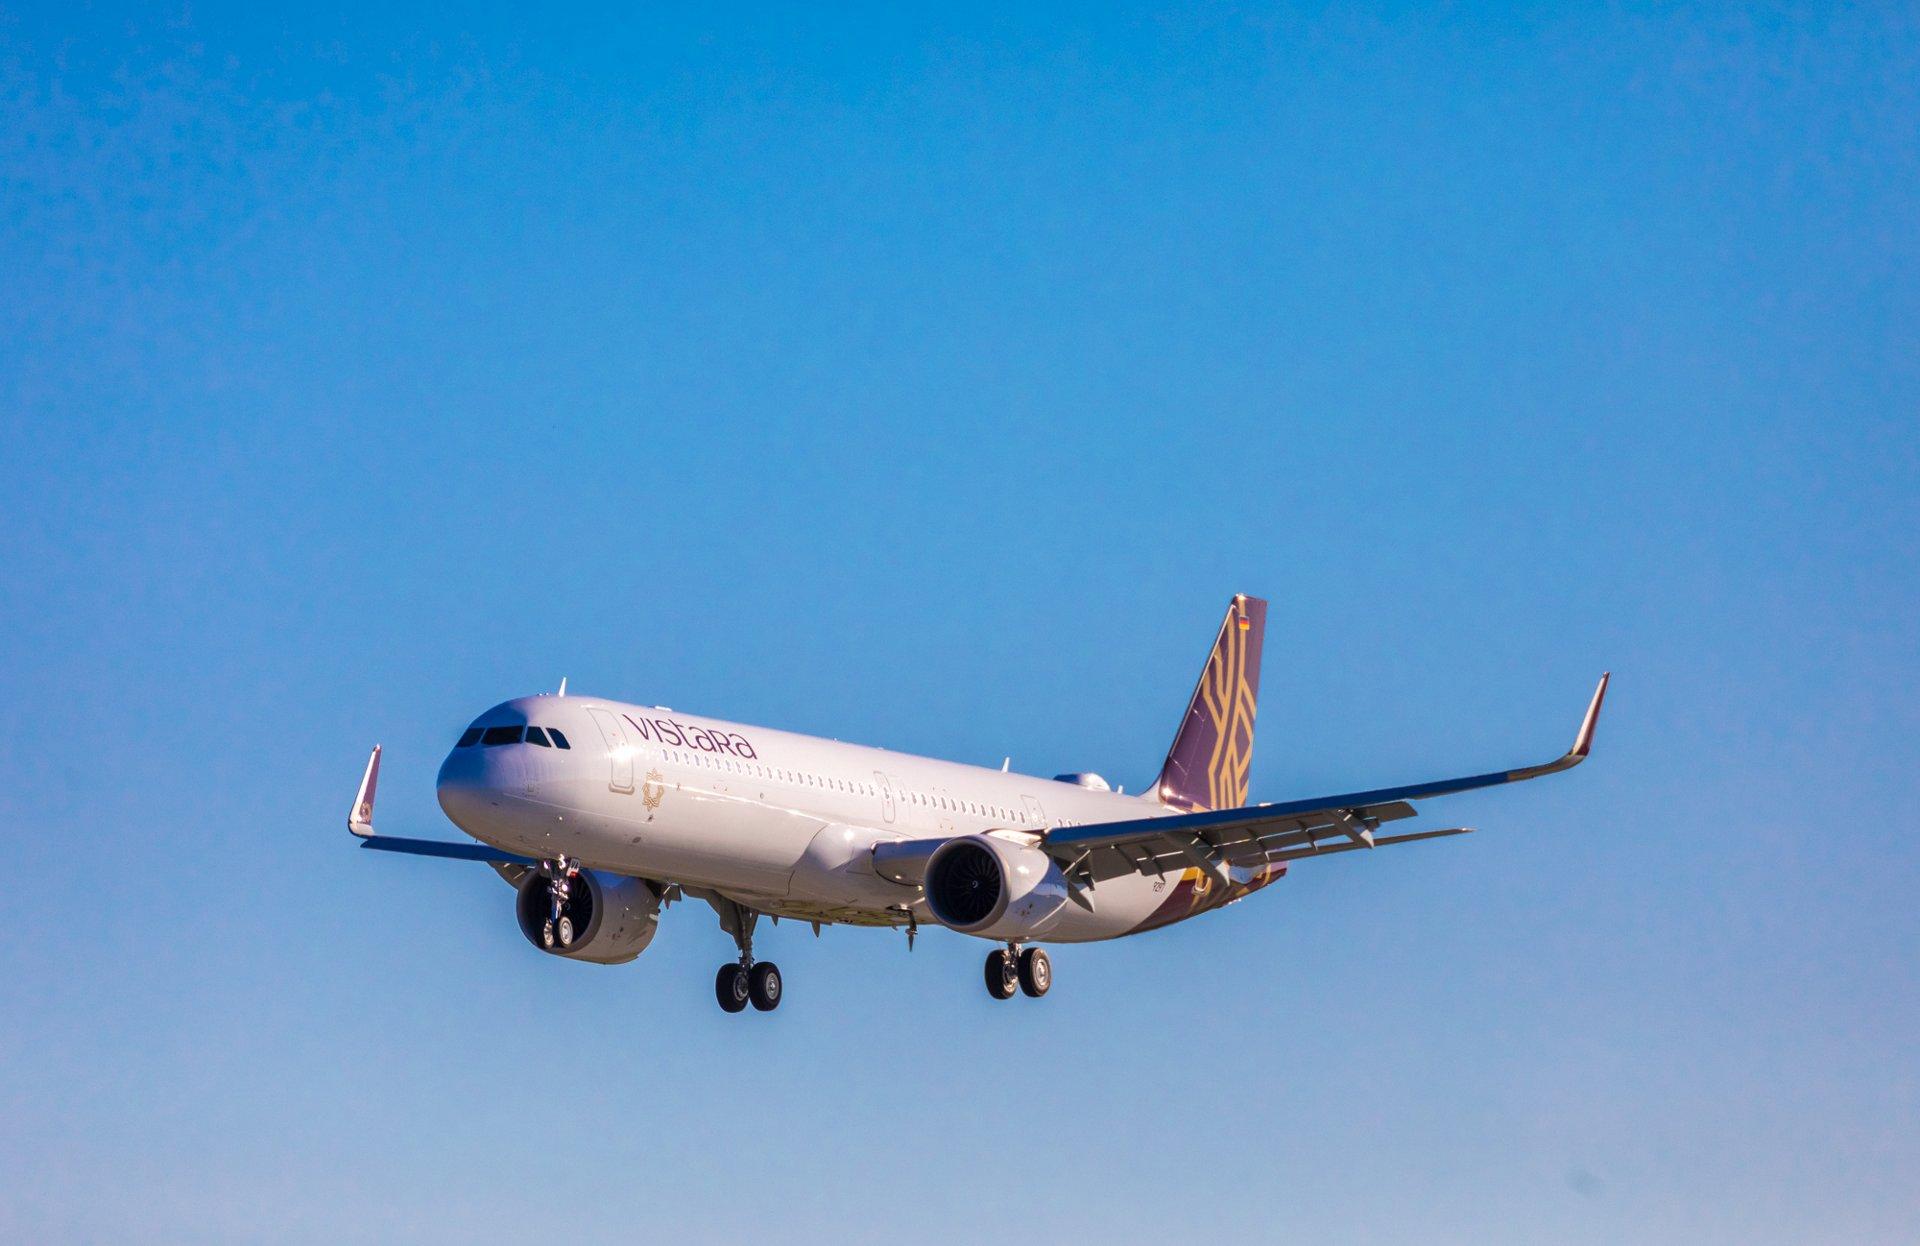 Vistara receives its first A321neo aircraft with flat-bed business class